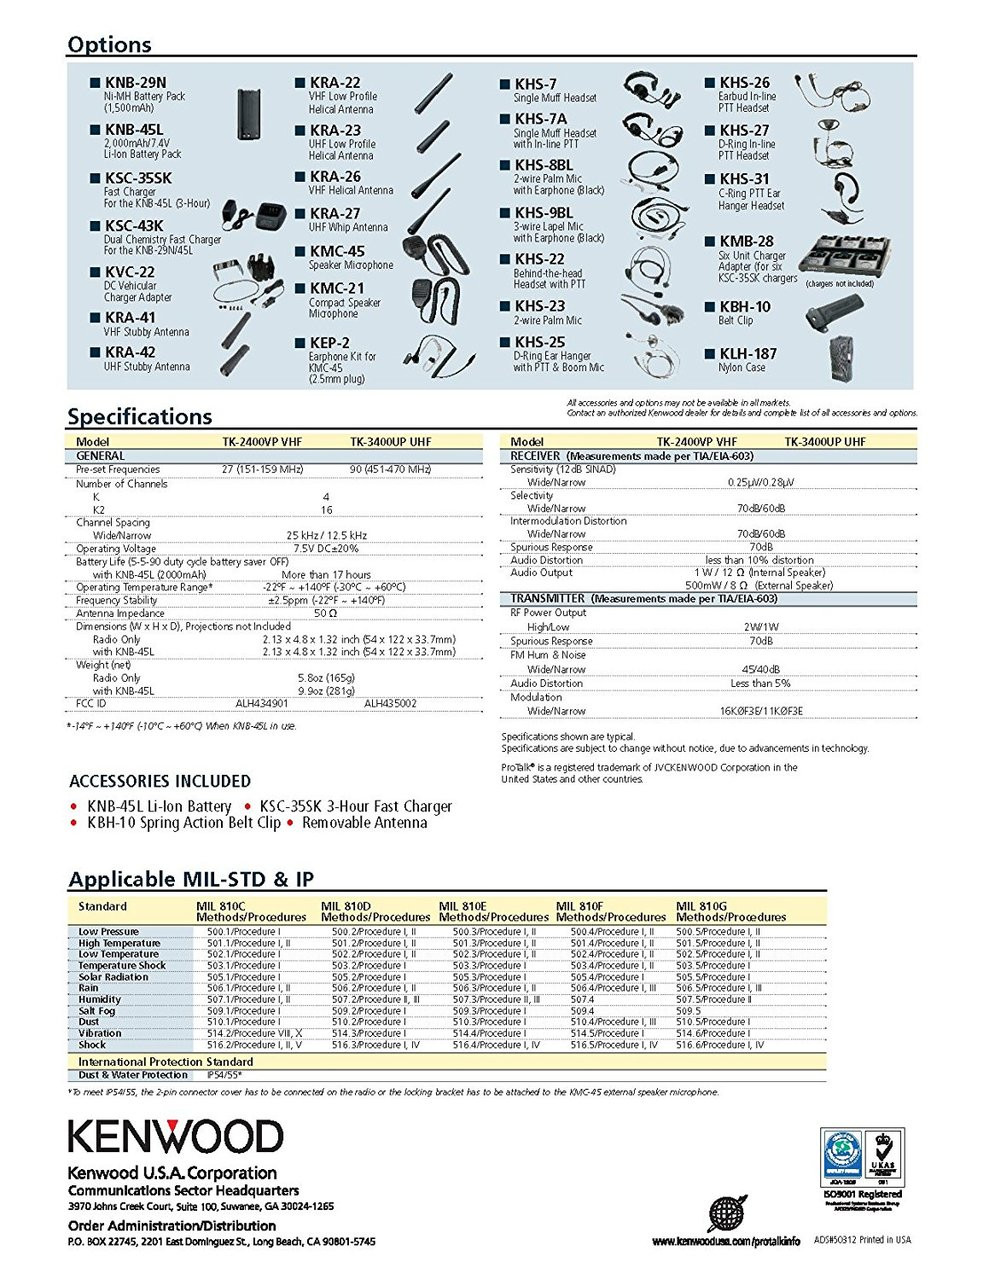 Kenwood ProTalk TK2402V16P 2 Watt 4 Channel VHF Two Way Radio Spec Sheet Page 2 of 2